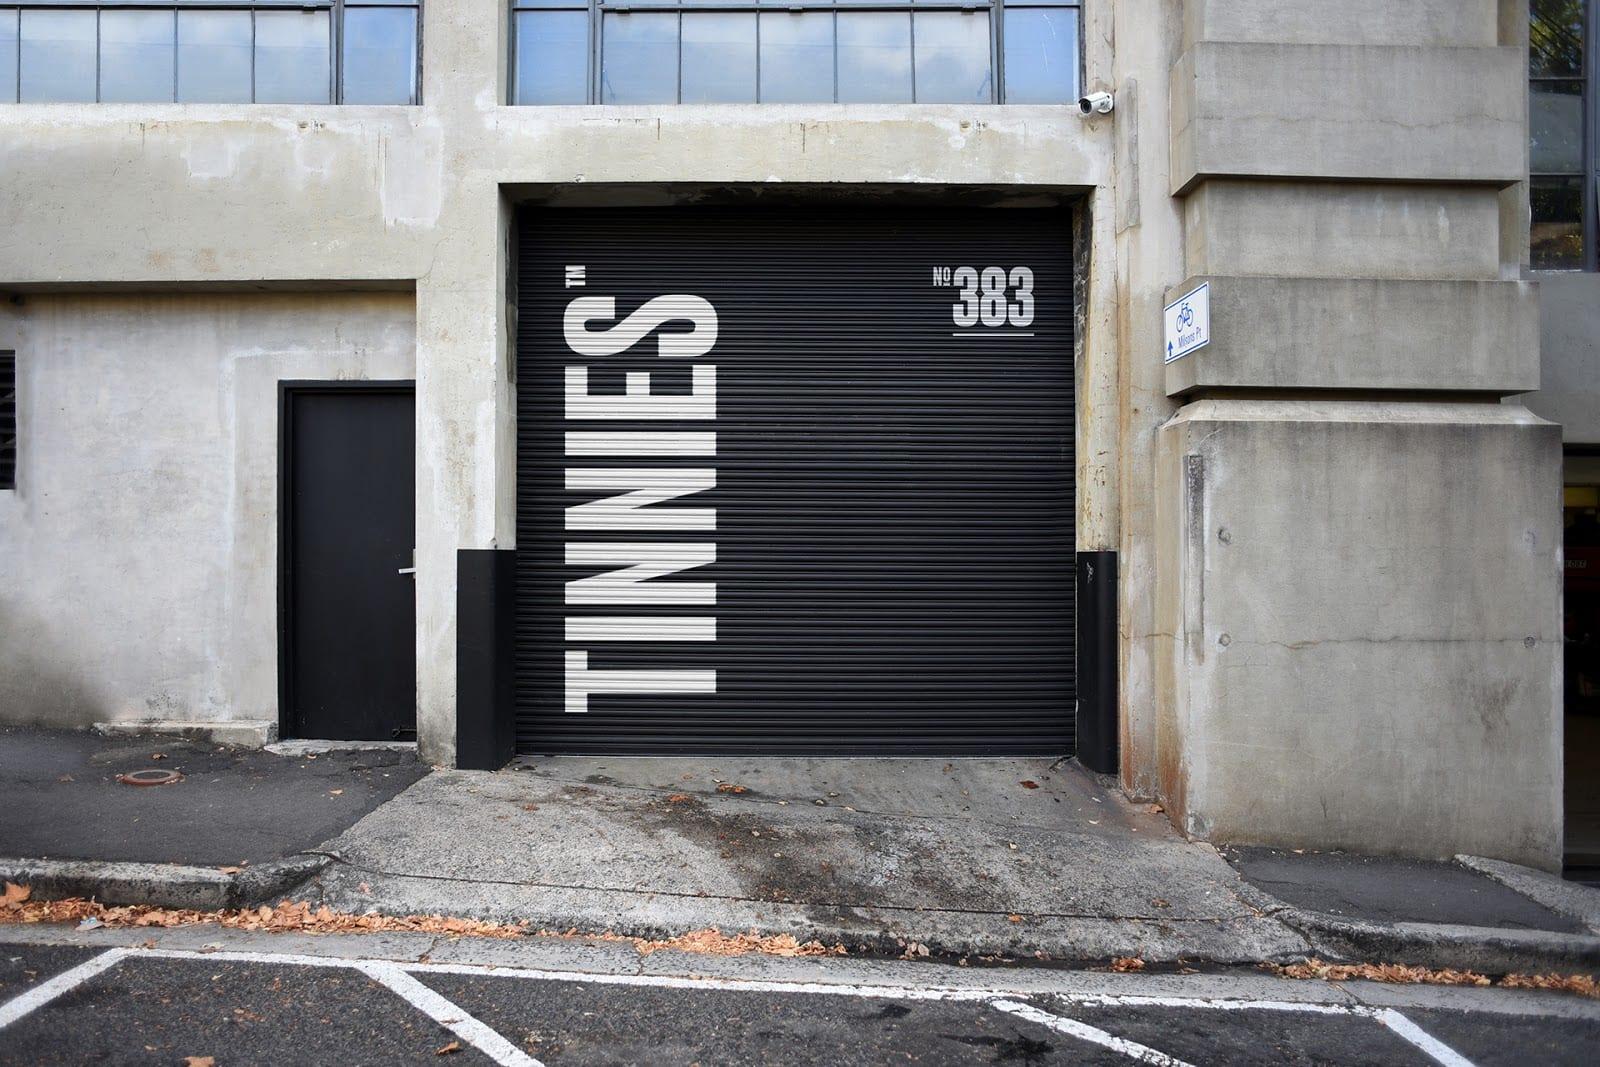 04 tinnies case study - Ach, tie obaly – Tinnier